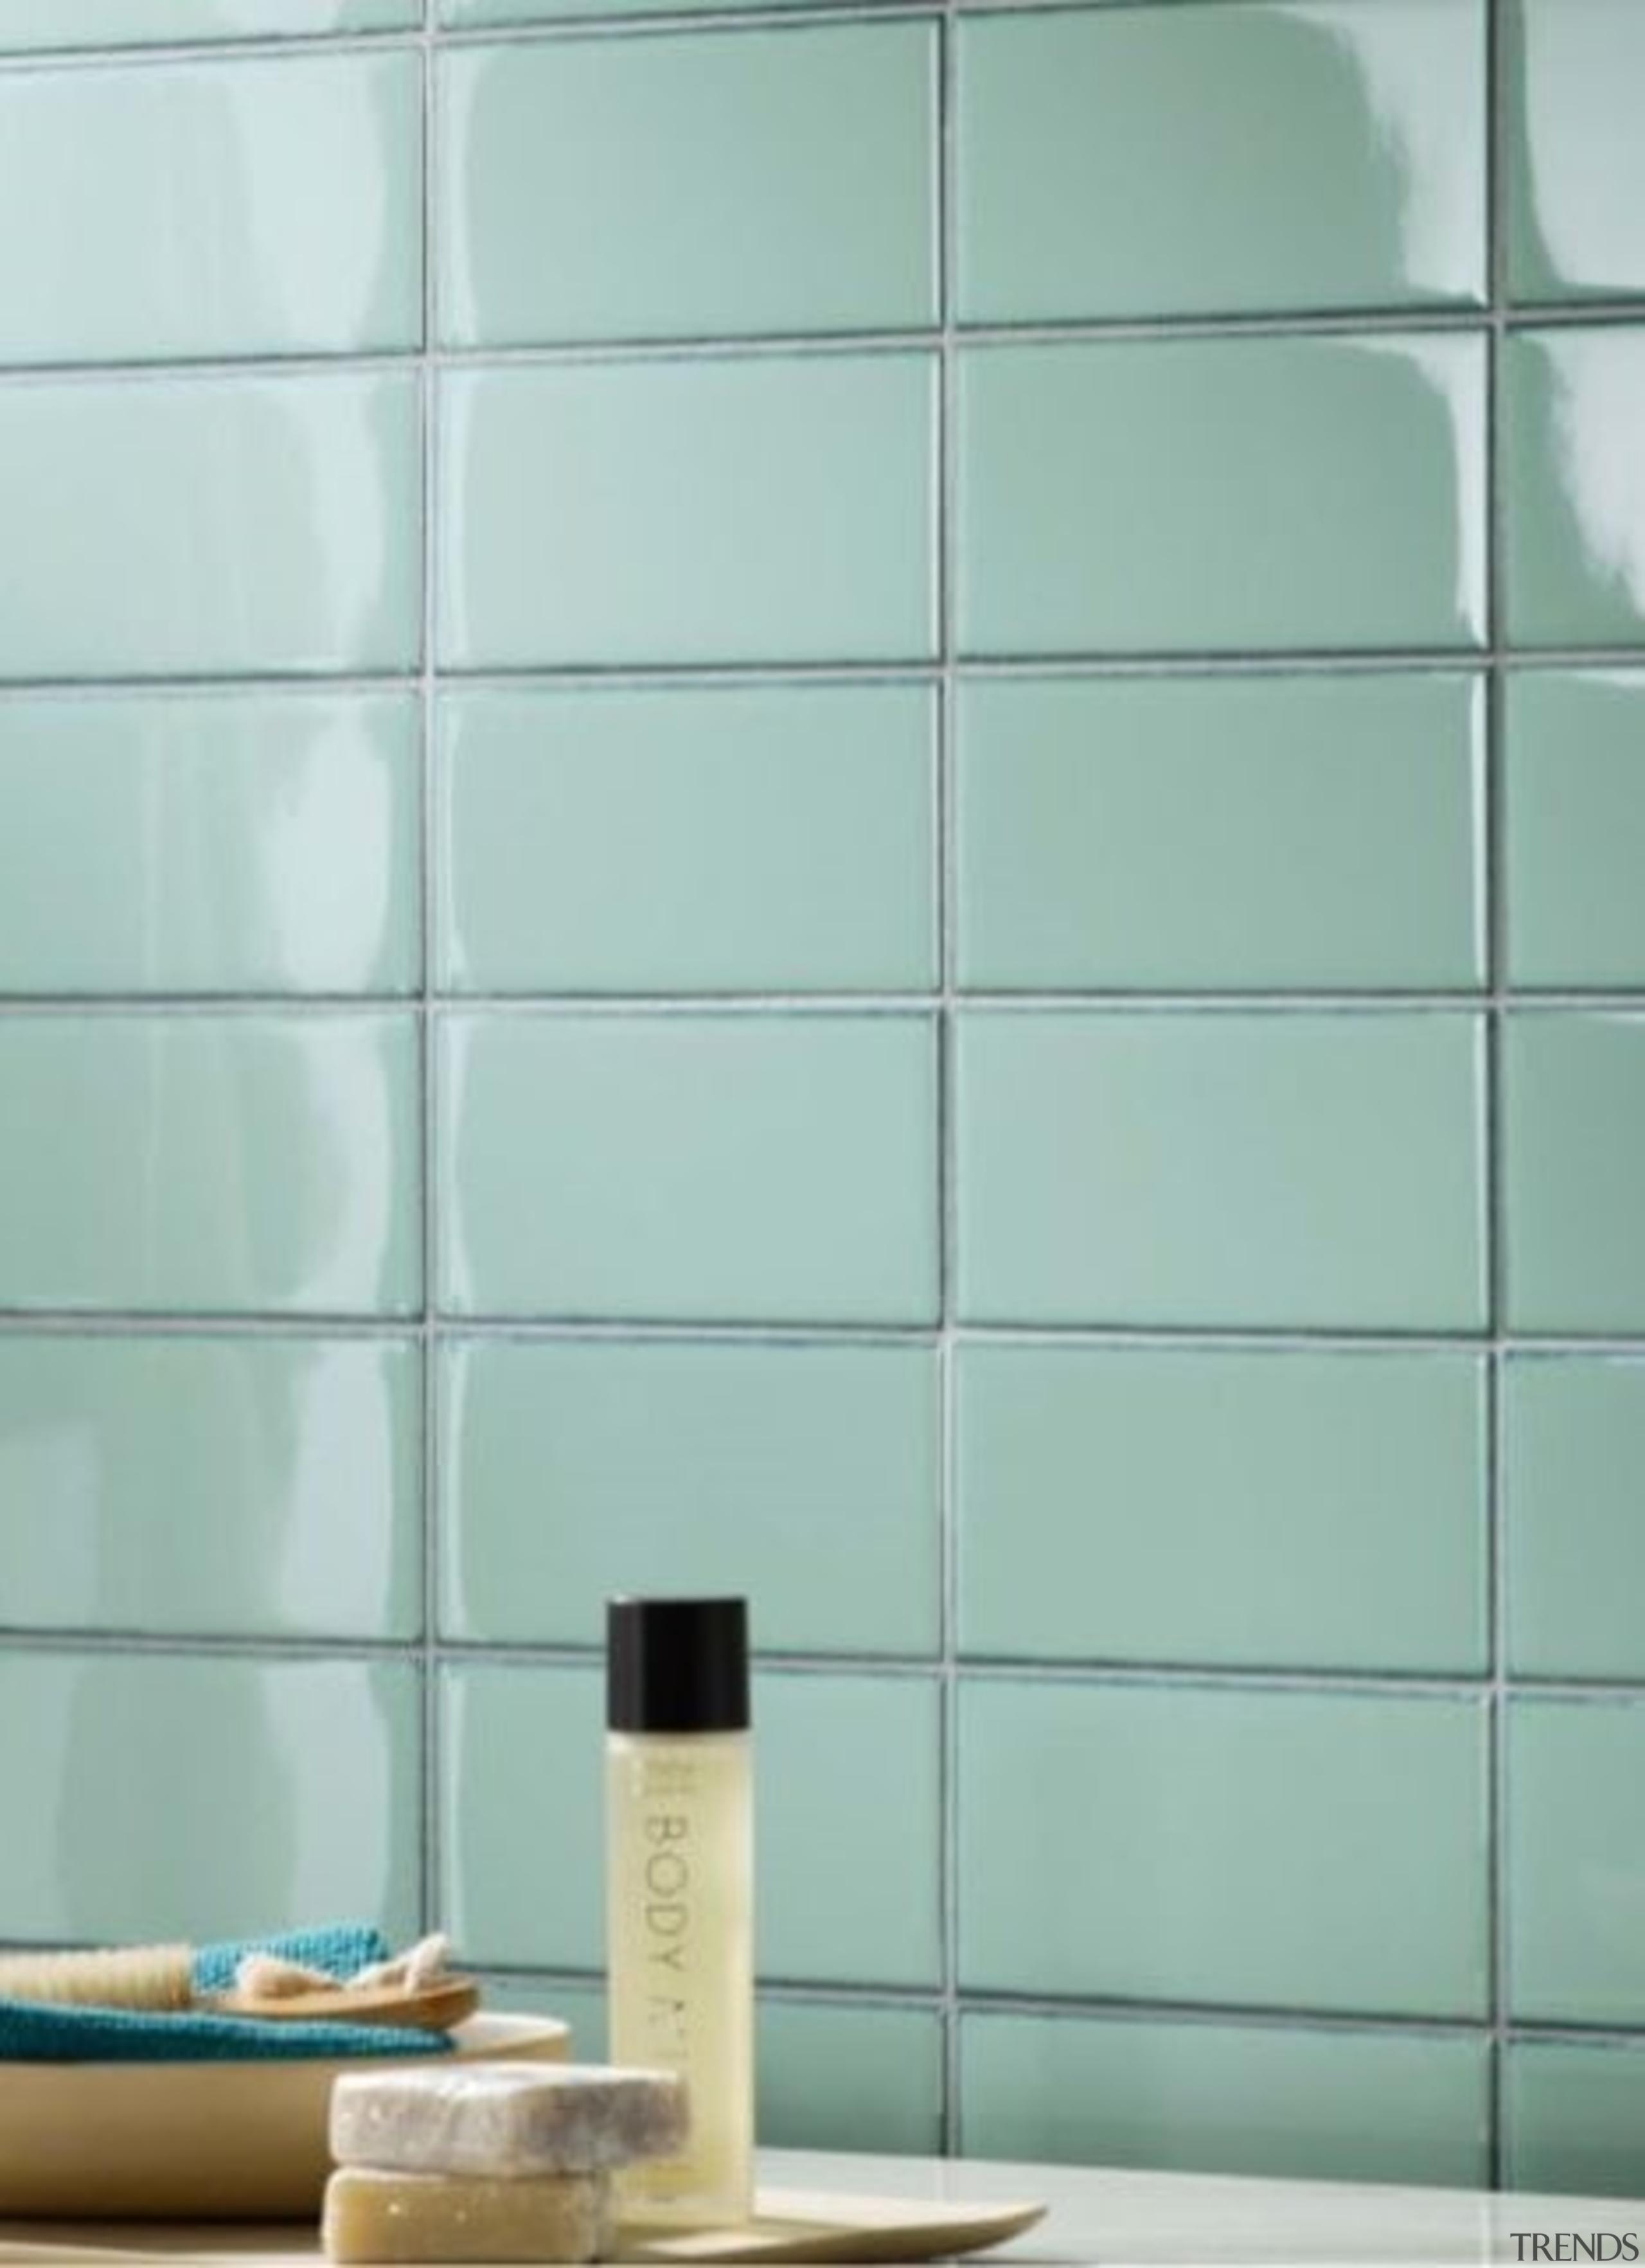 The high gloss finish reflects light, illuminating small floor, flooring, glass, interior design, product, shelf, tile, wall, gray